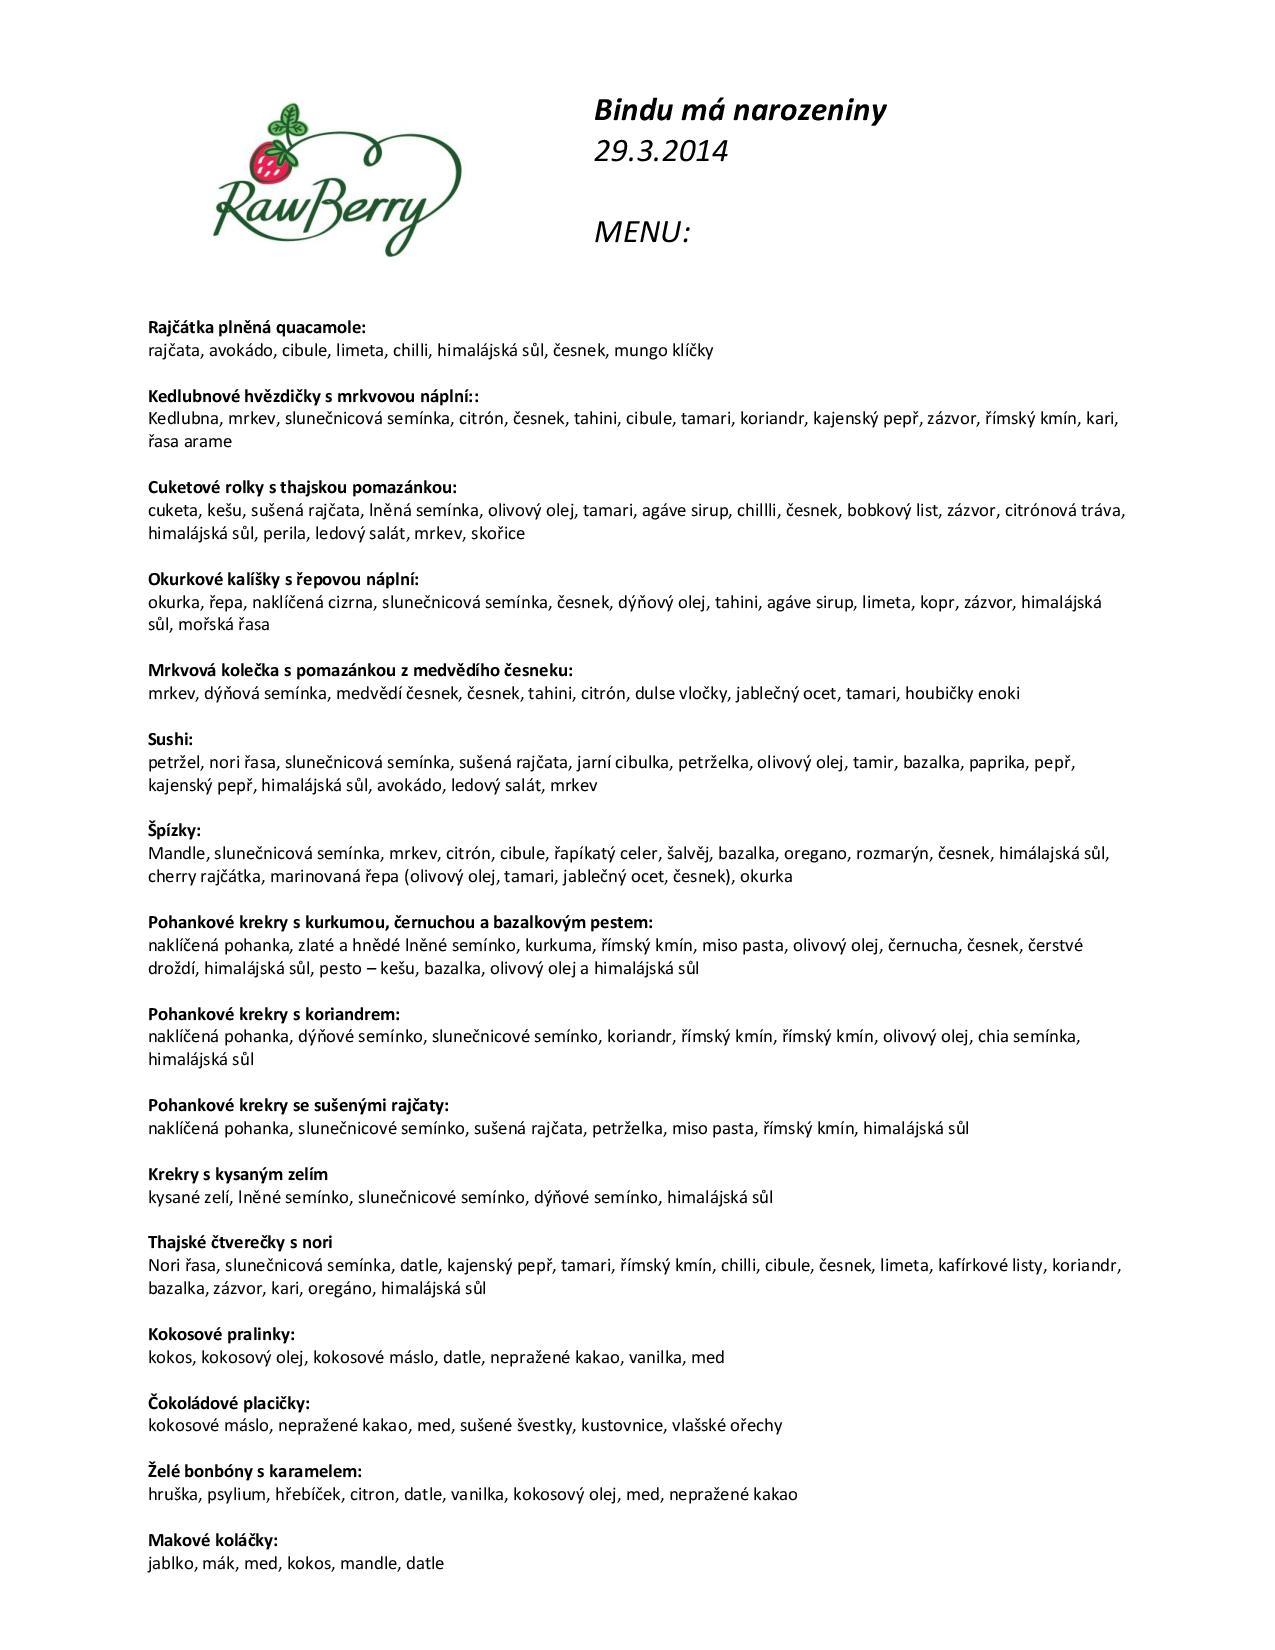 oslava narozenin menu Oslava narozenin jógového centra Bindu Yoga | Rawberry oslava narozenin menu